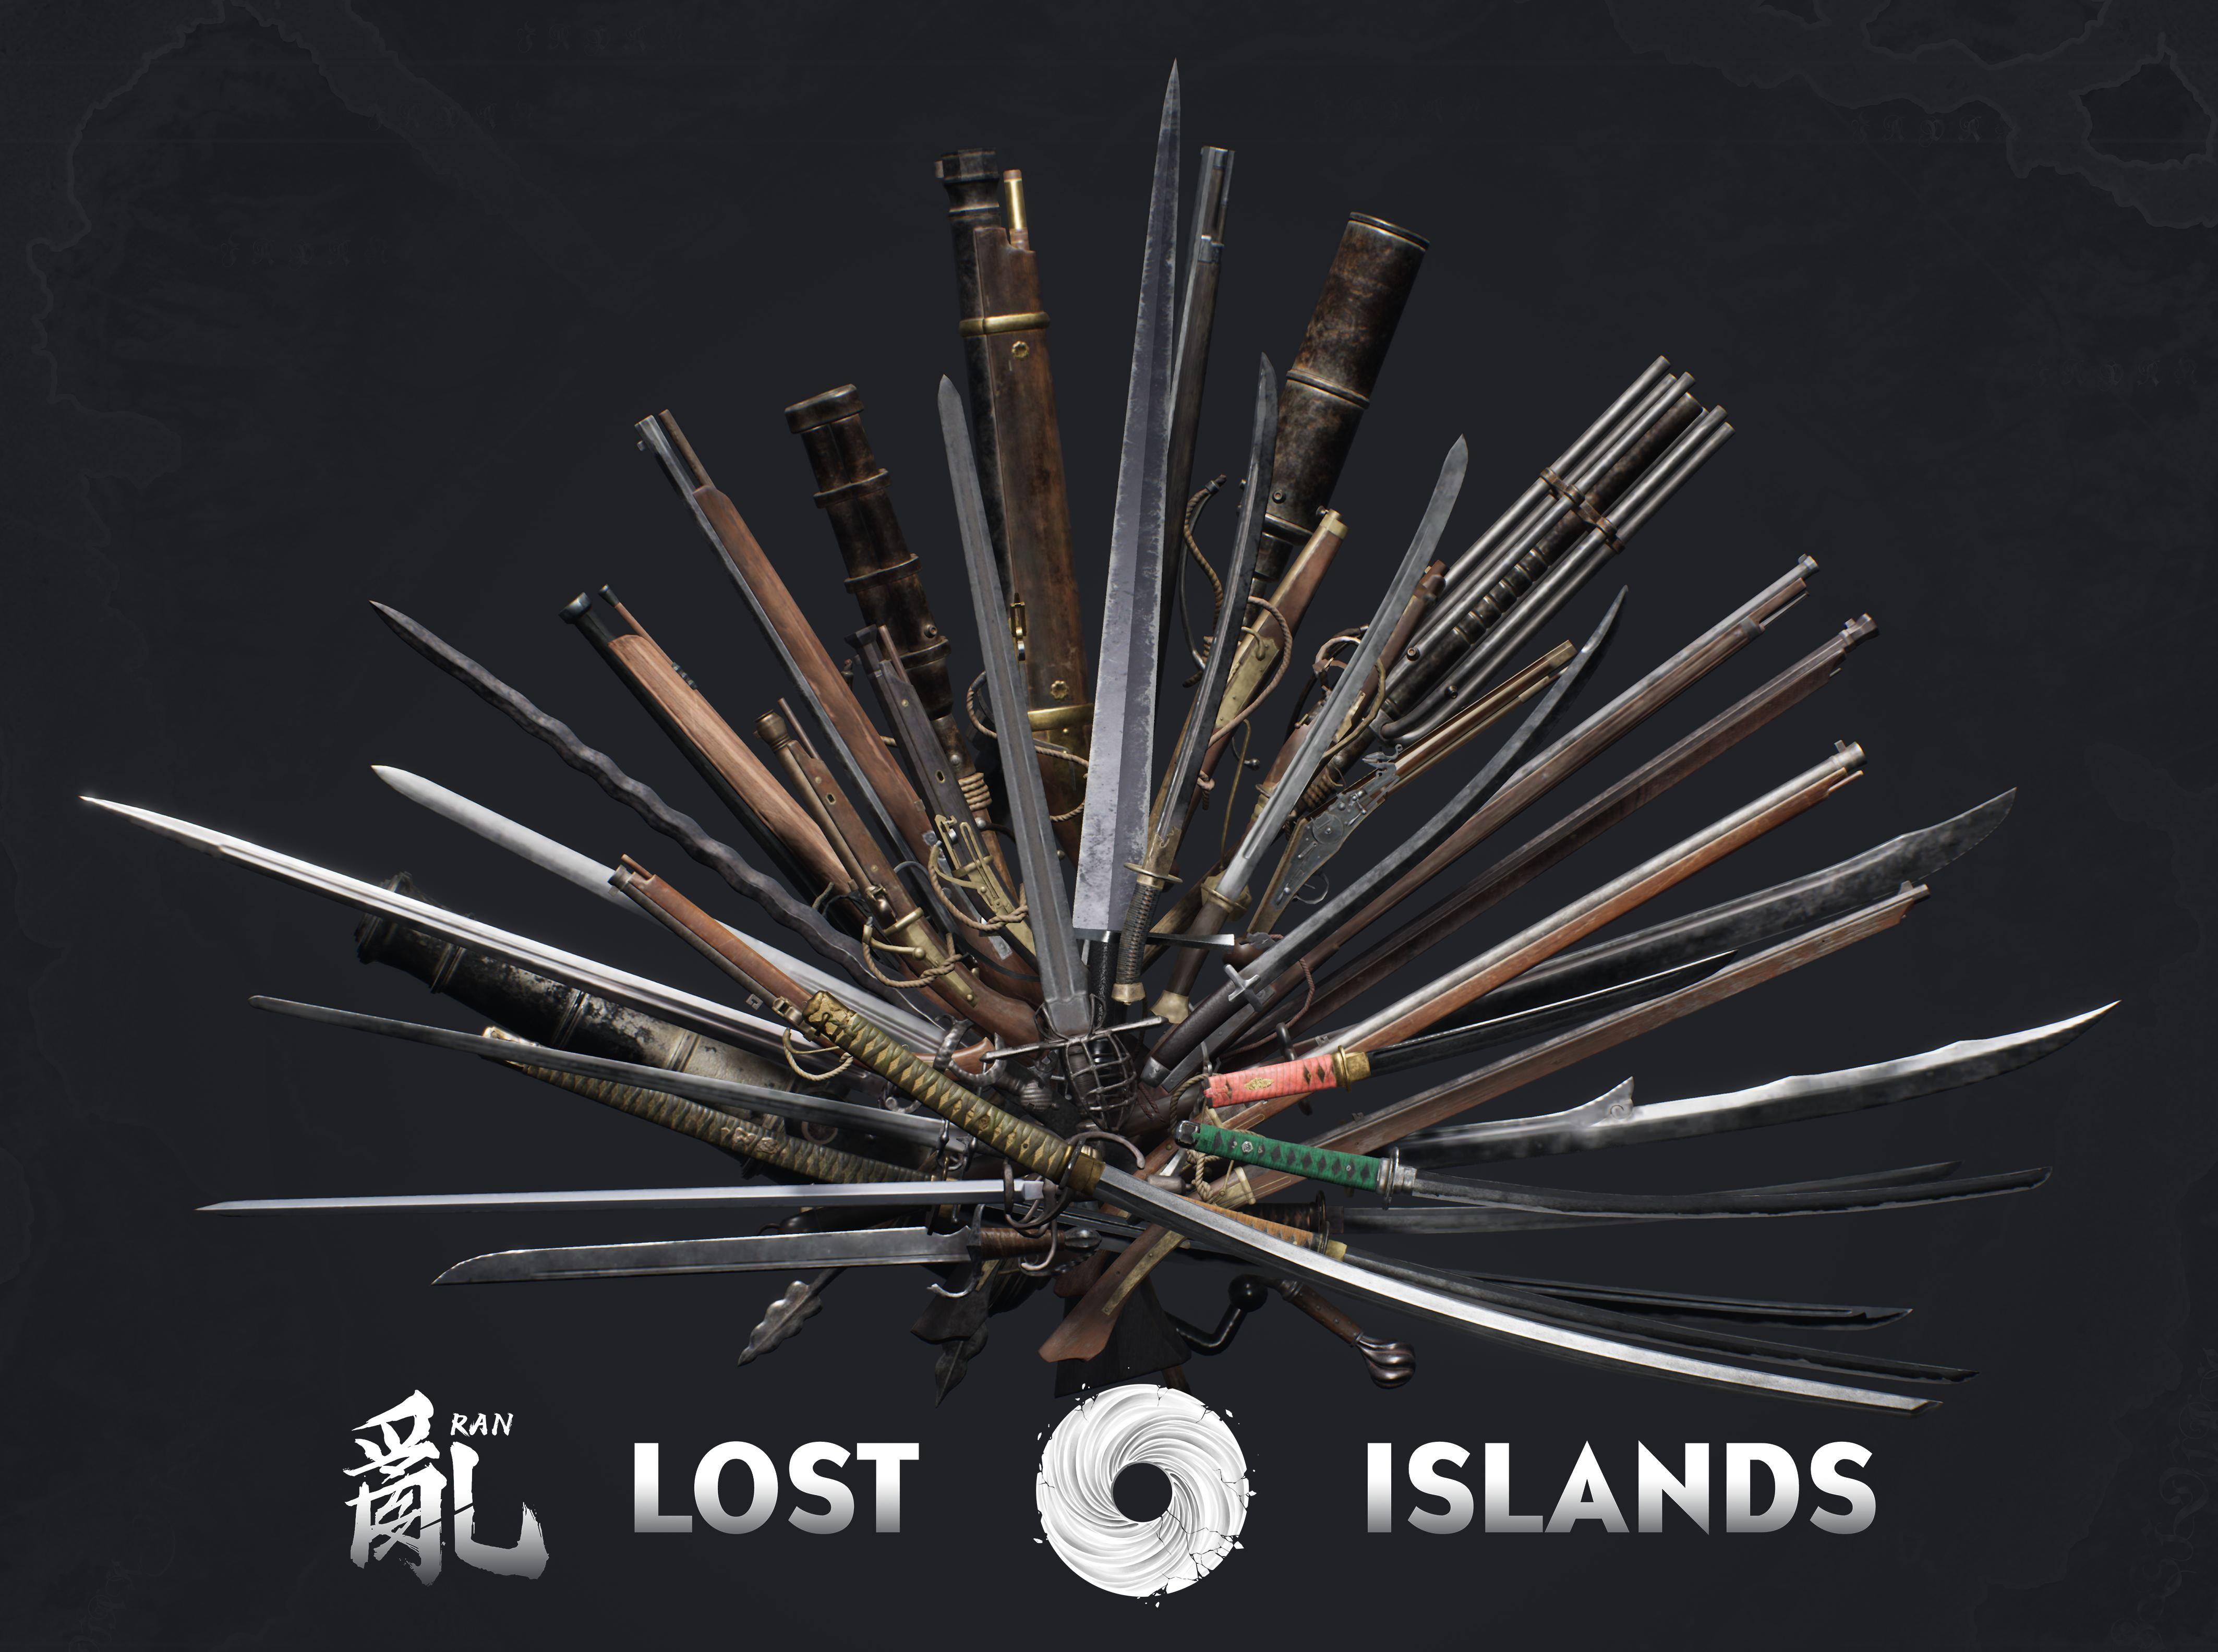 RAN Lost Islands Weaponry 01